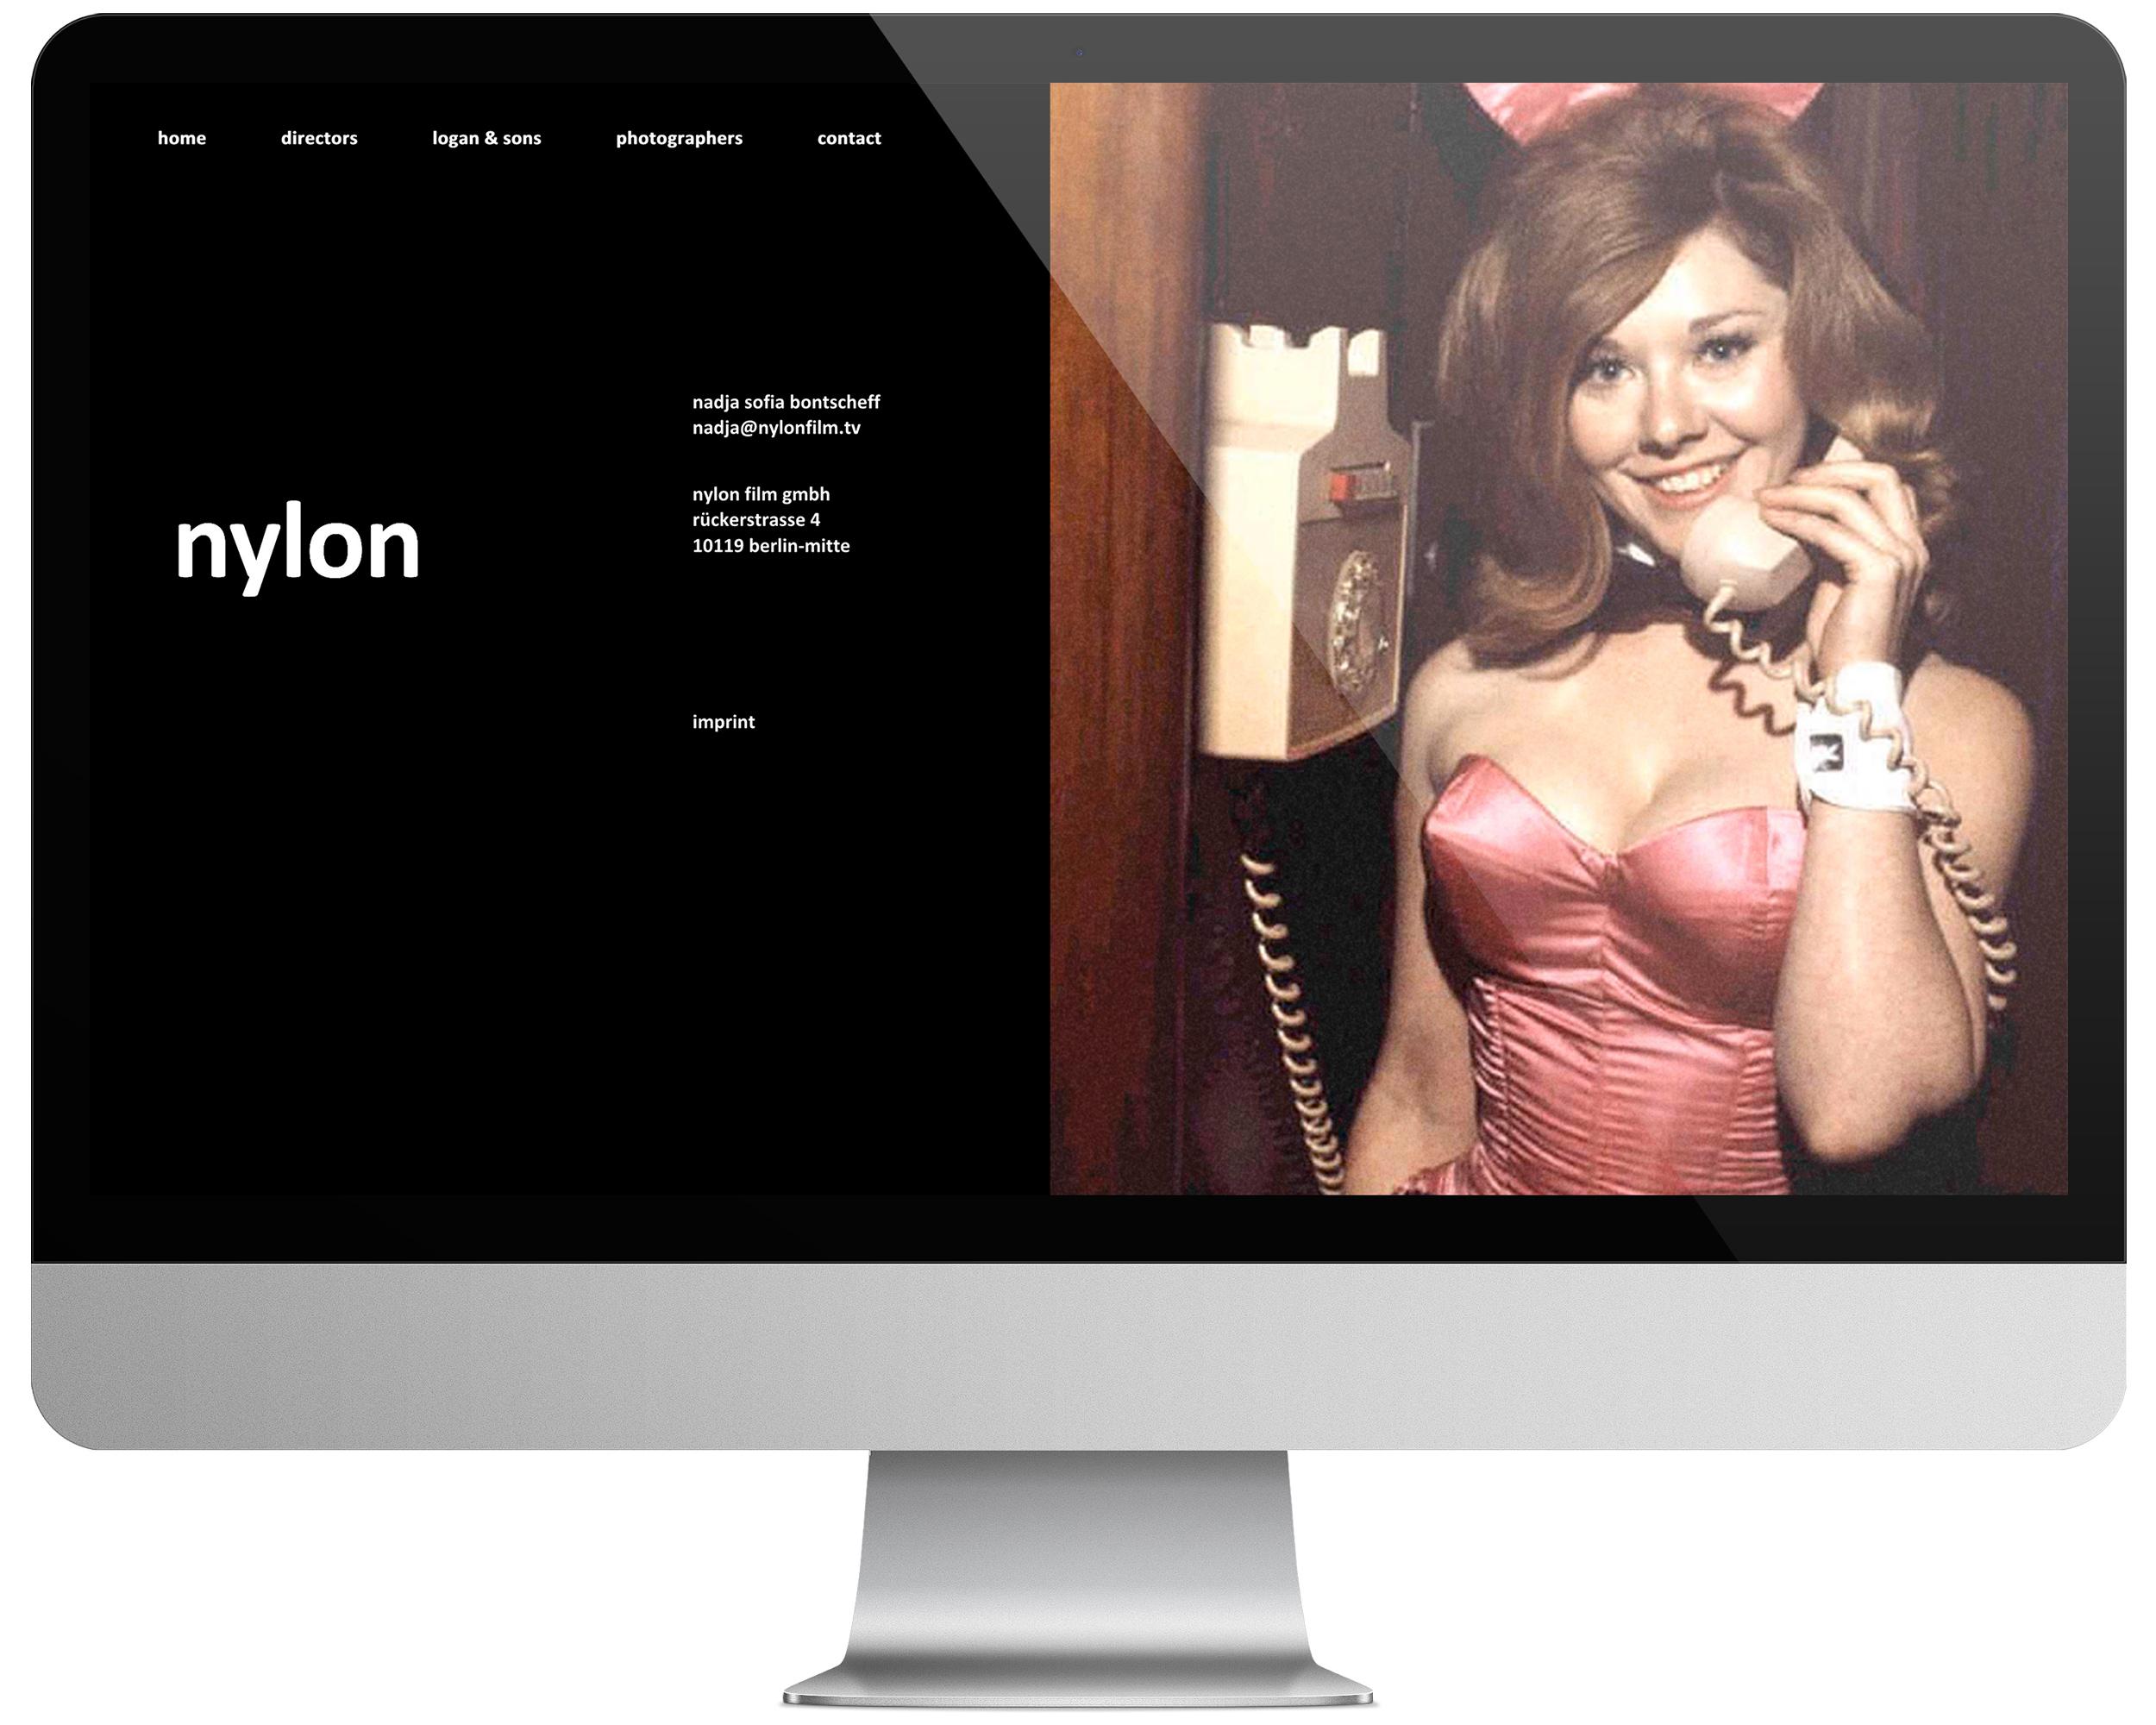 003_Nylon-Film_iMAC_2500x2000.jpg